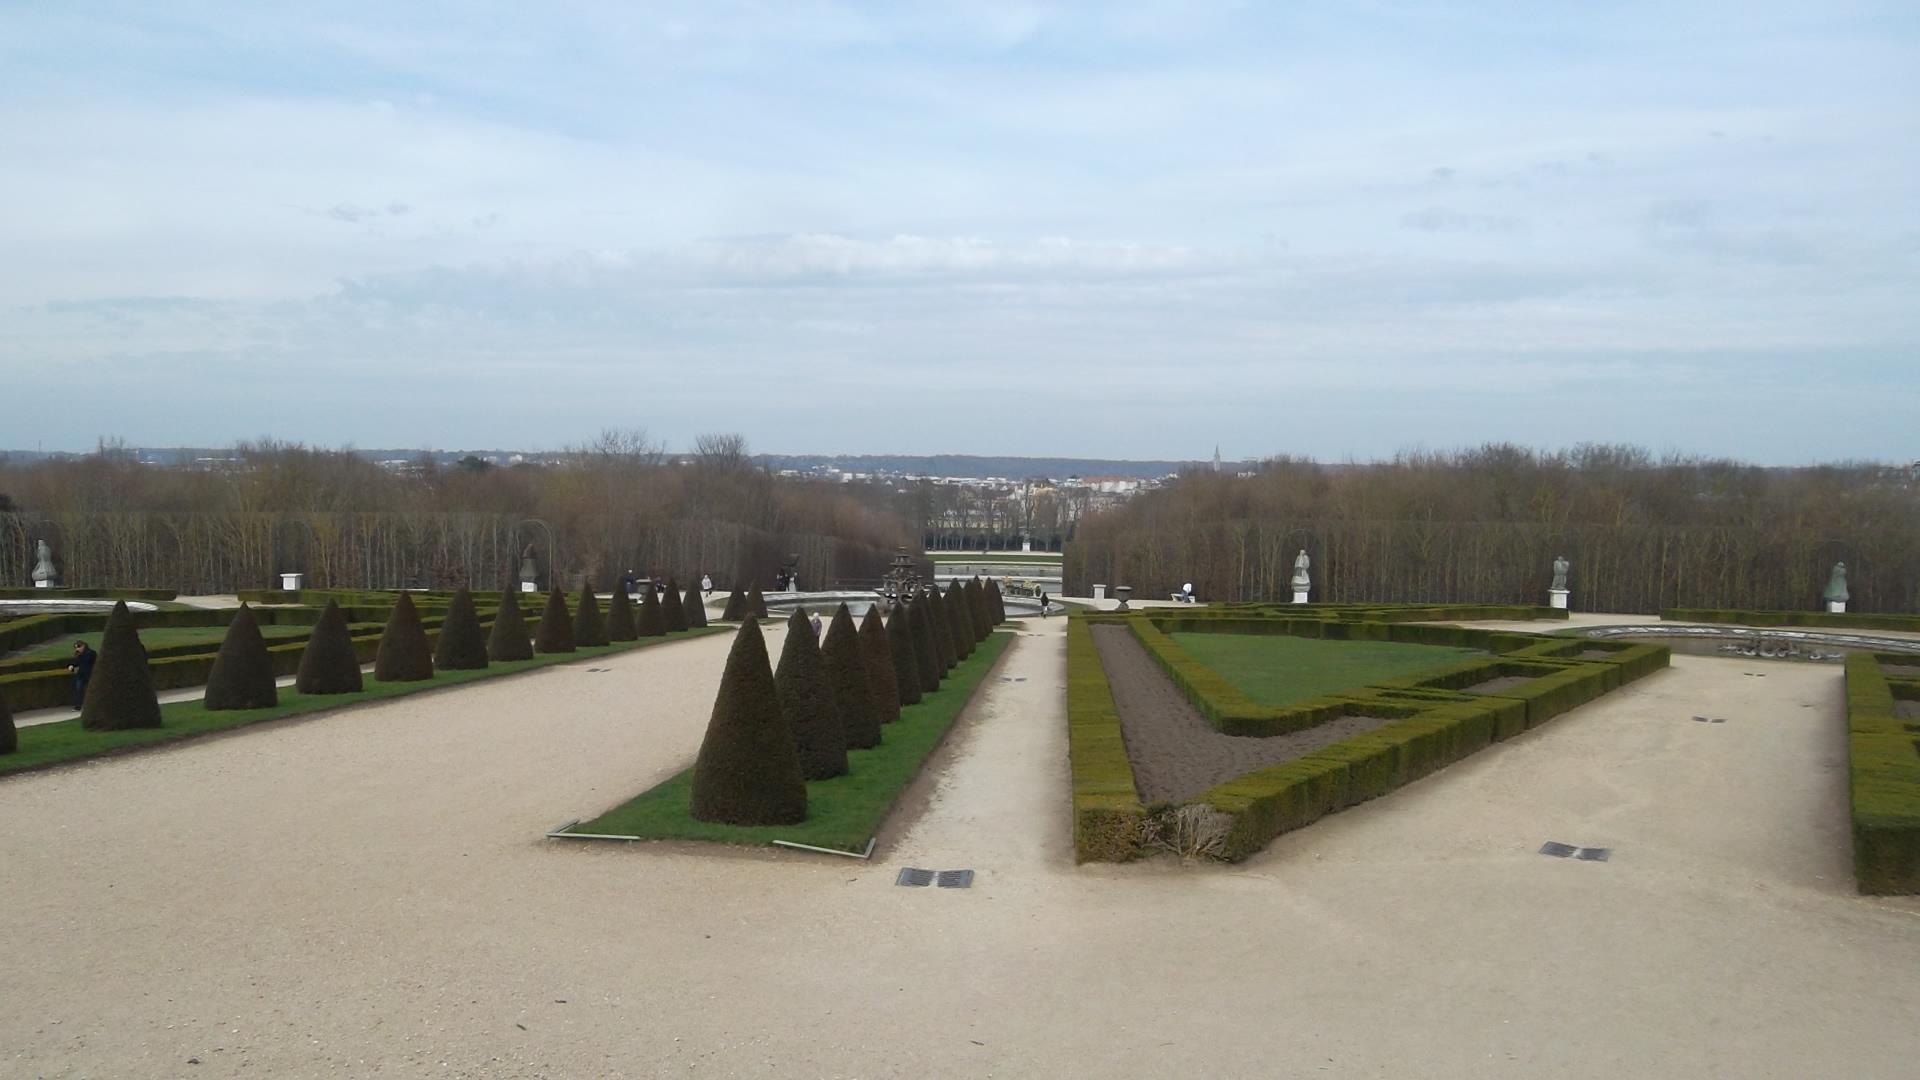 versailles-chateau-down-to-bassin-de-neptune-mar13